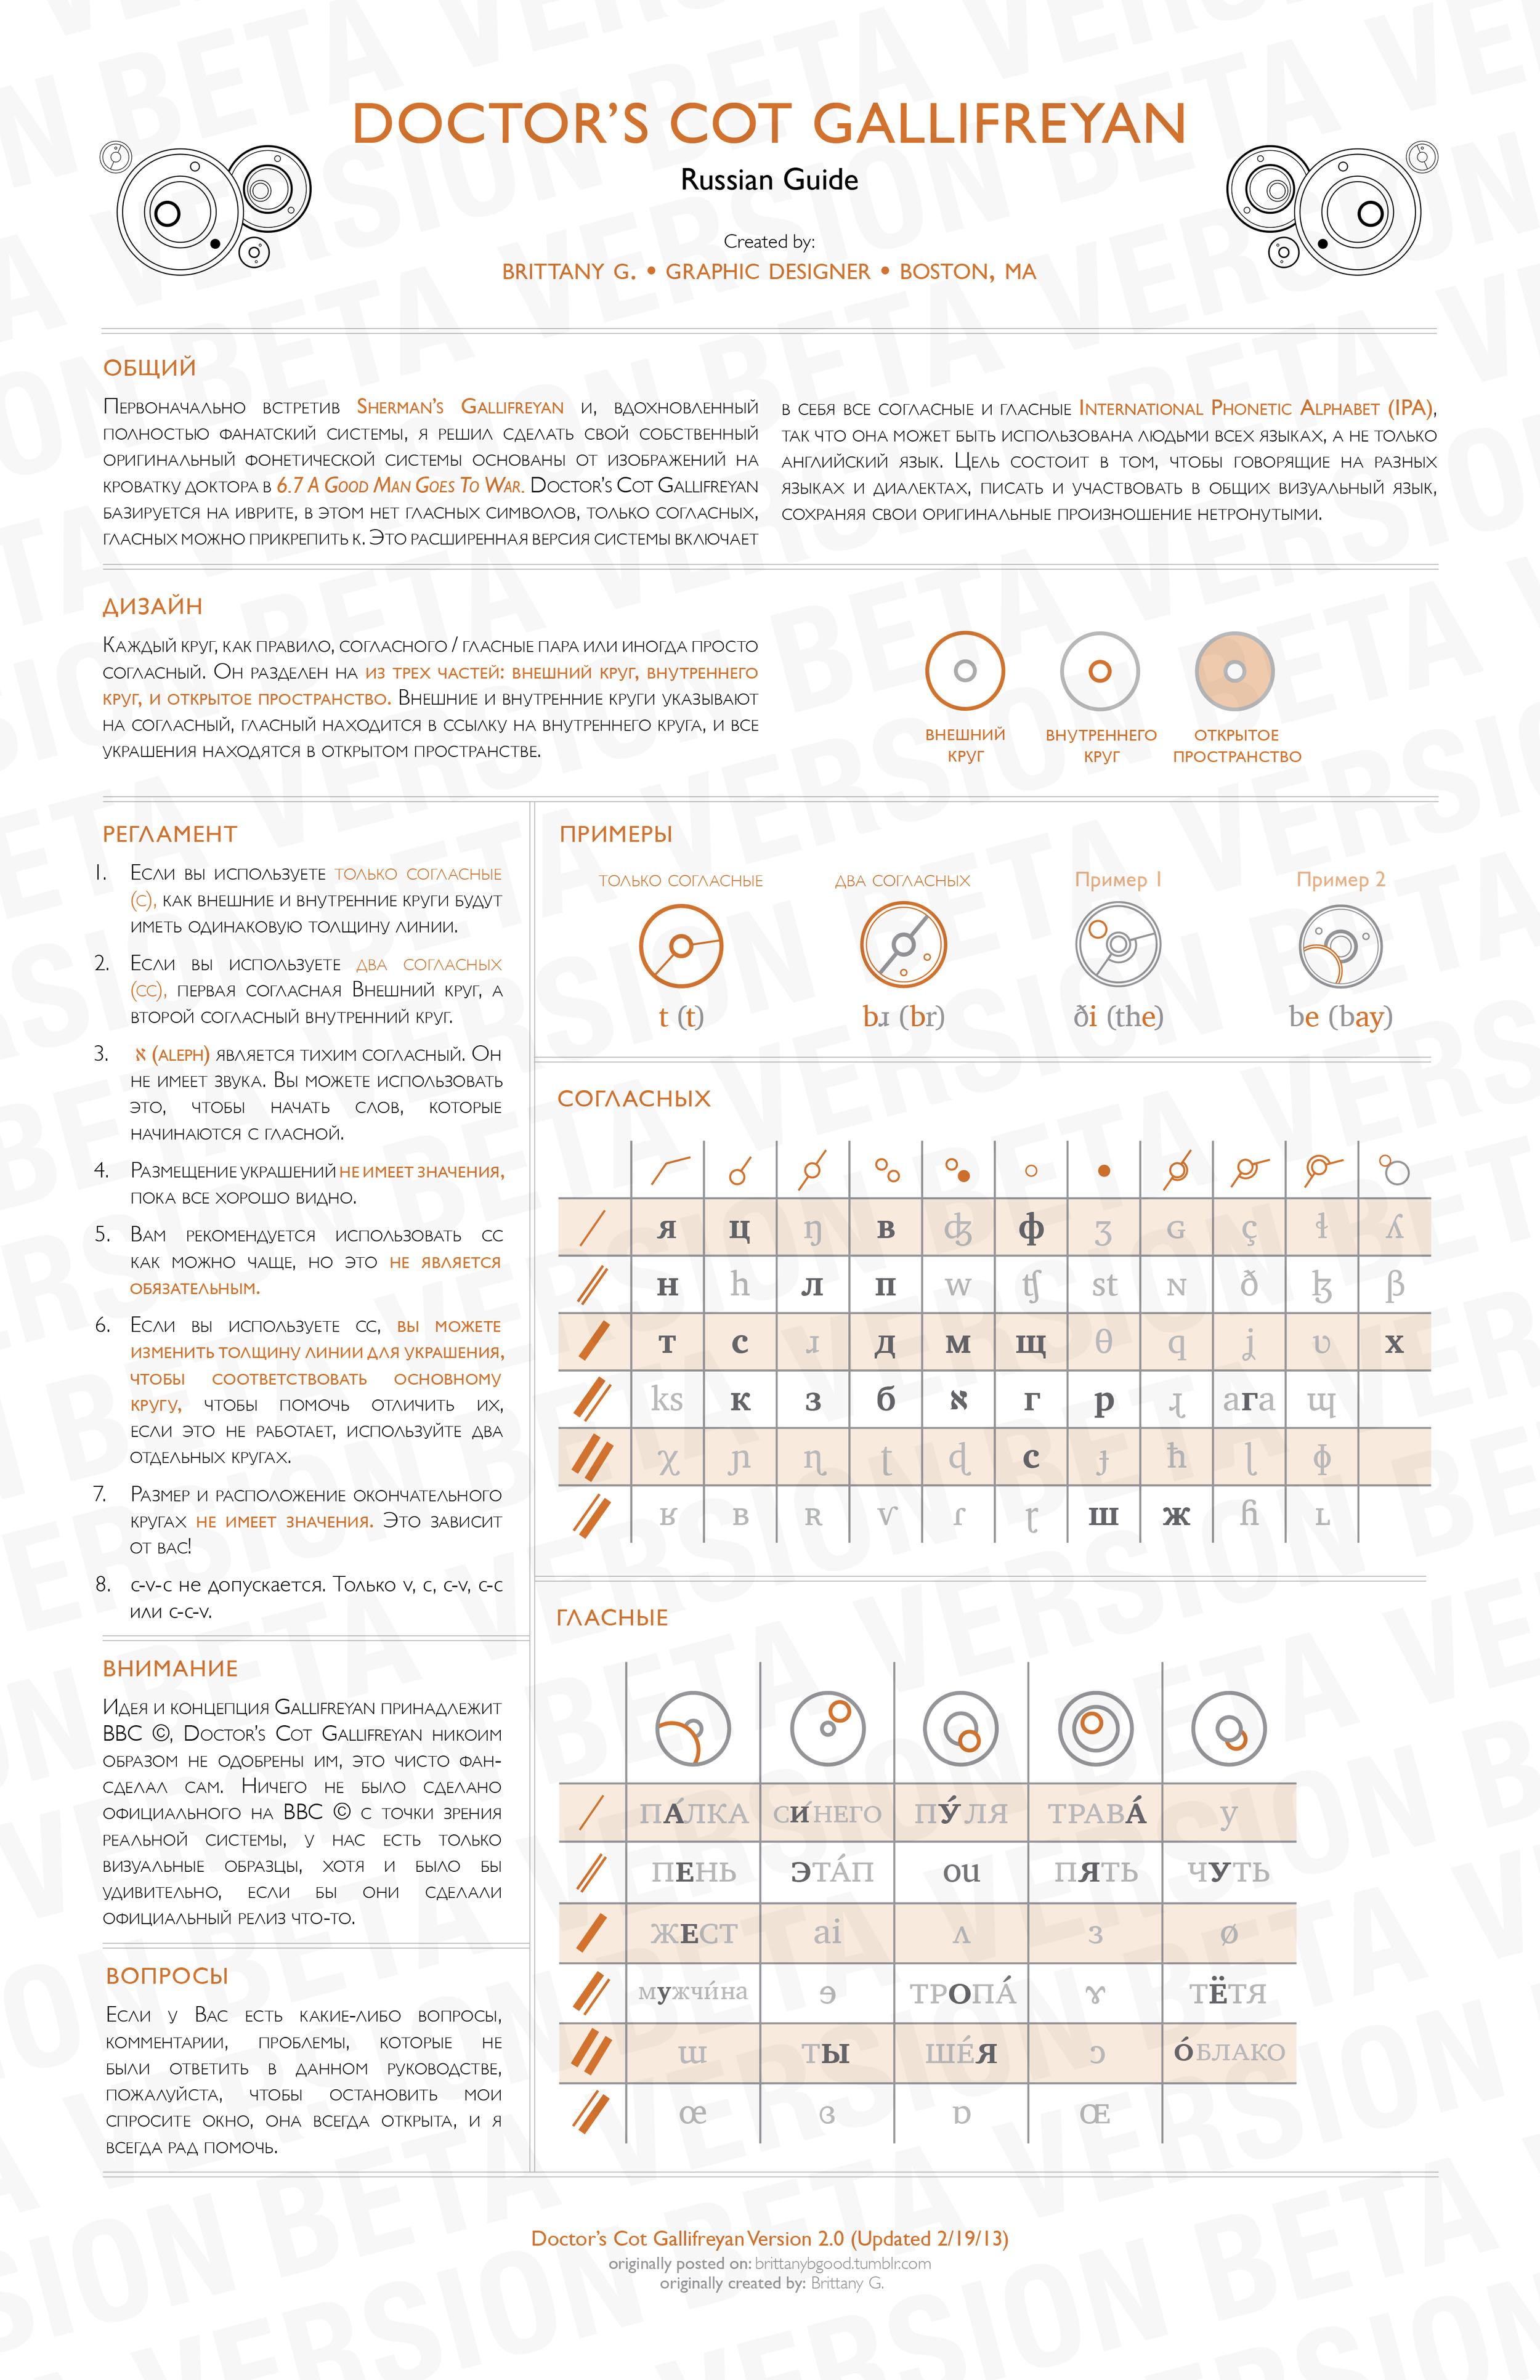 DoctorsCotSystem2.0MasterTable_IPA3 copy.jpg